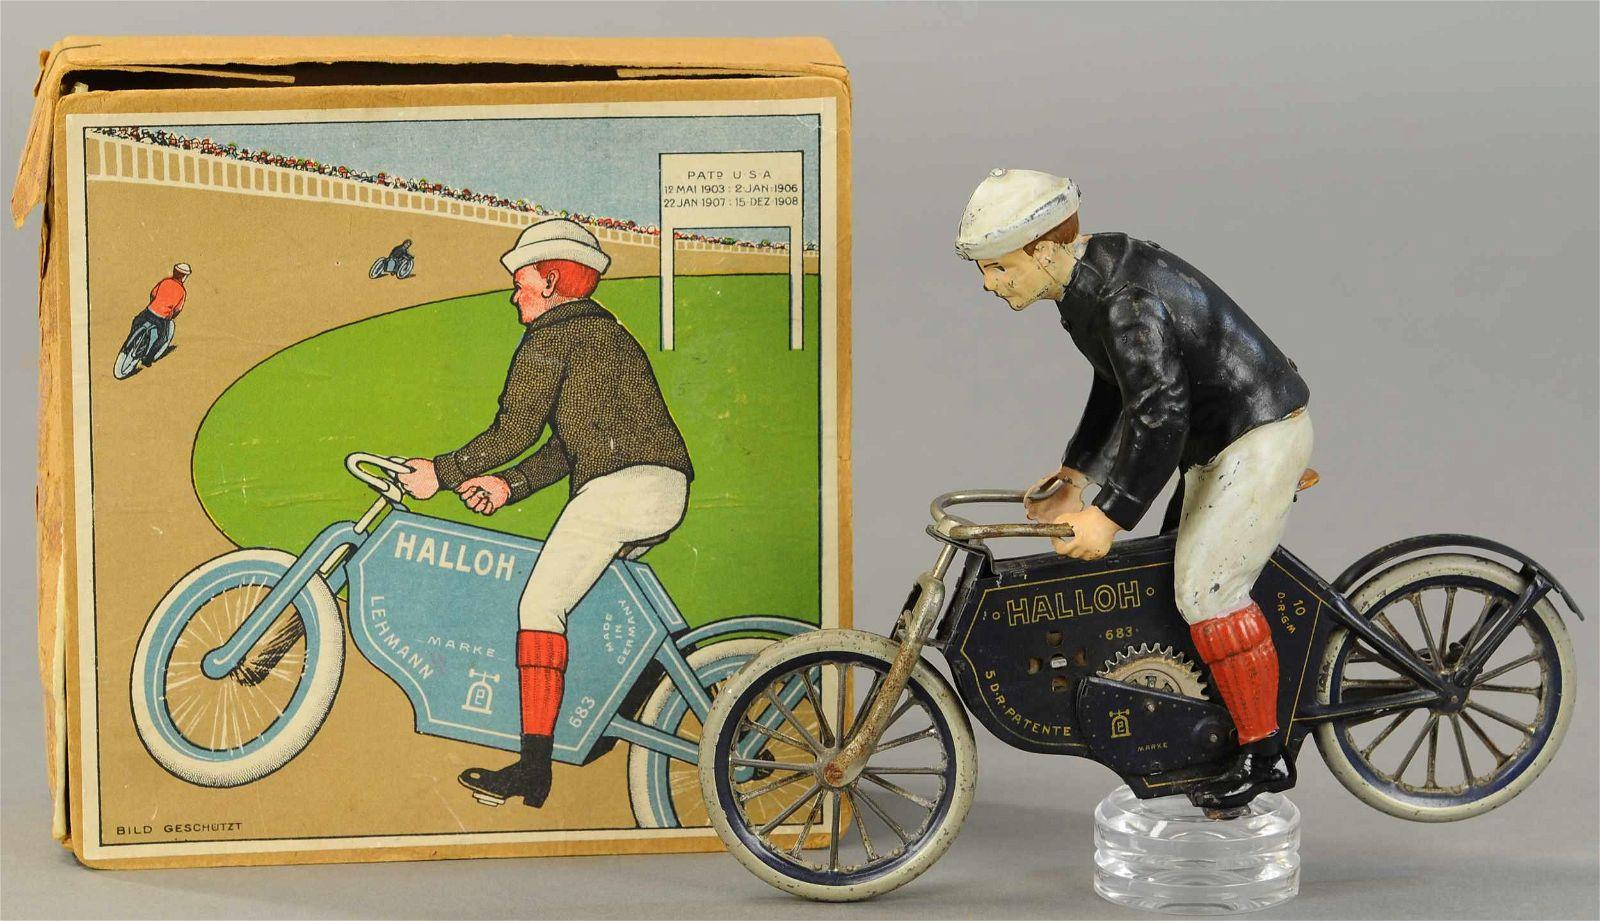 BOXED LEHMANN HALLOH MOTORCYCLE